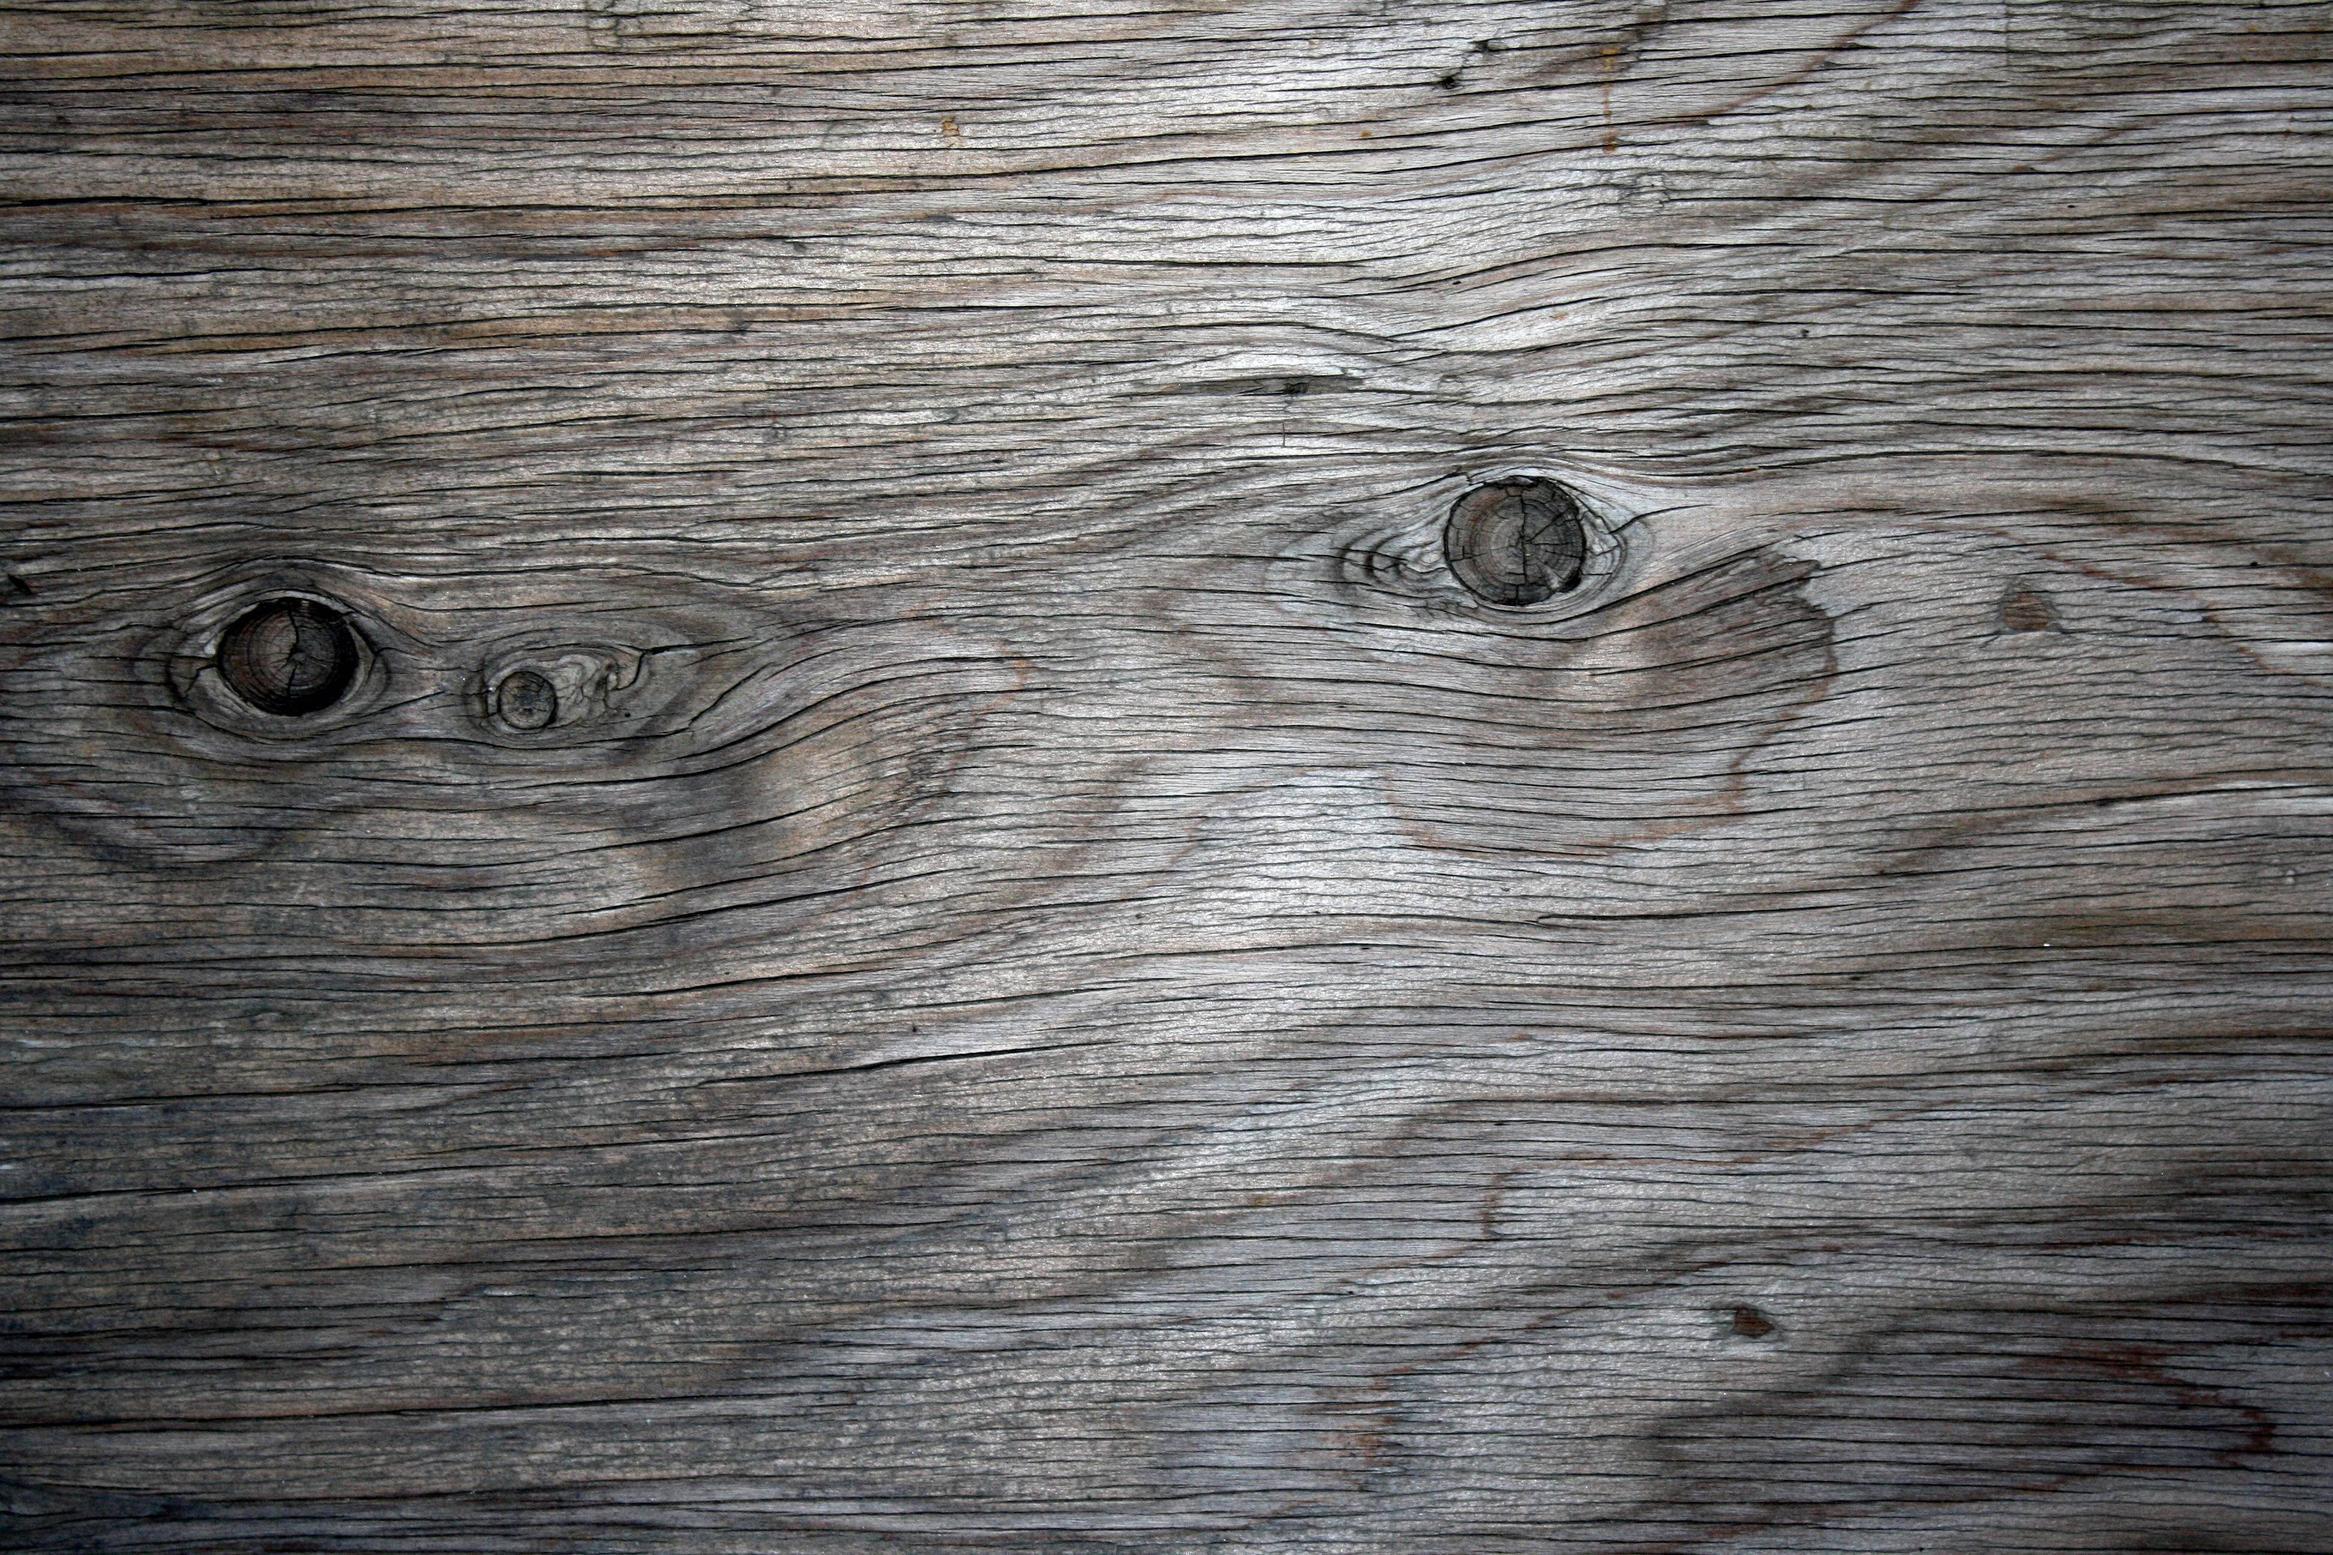 wood grain backgrounds